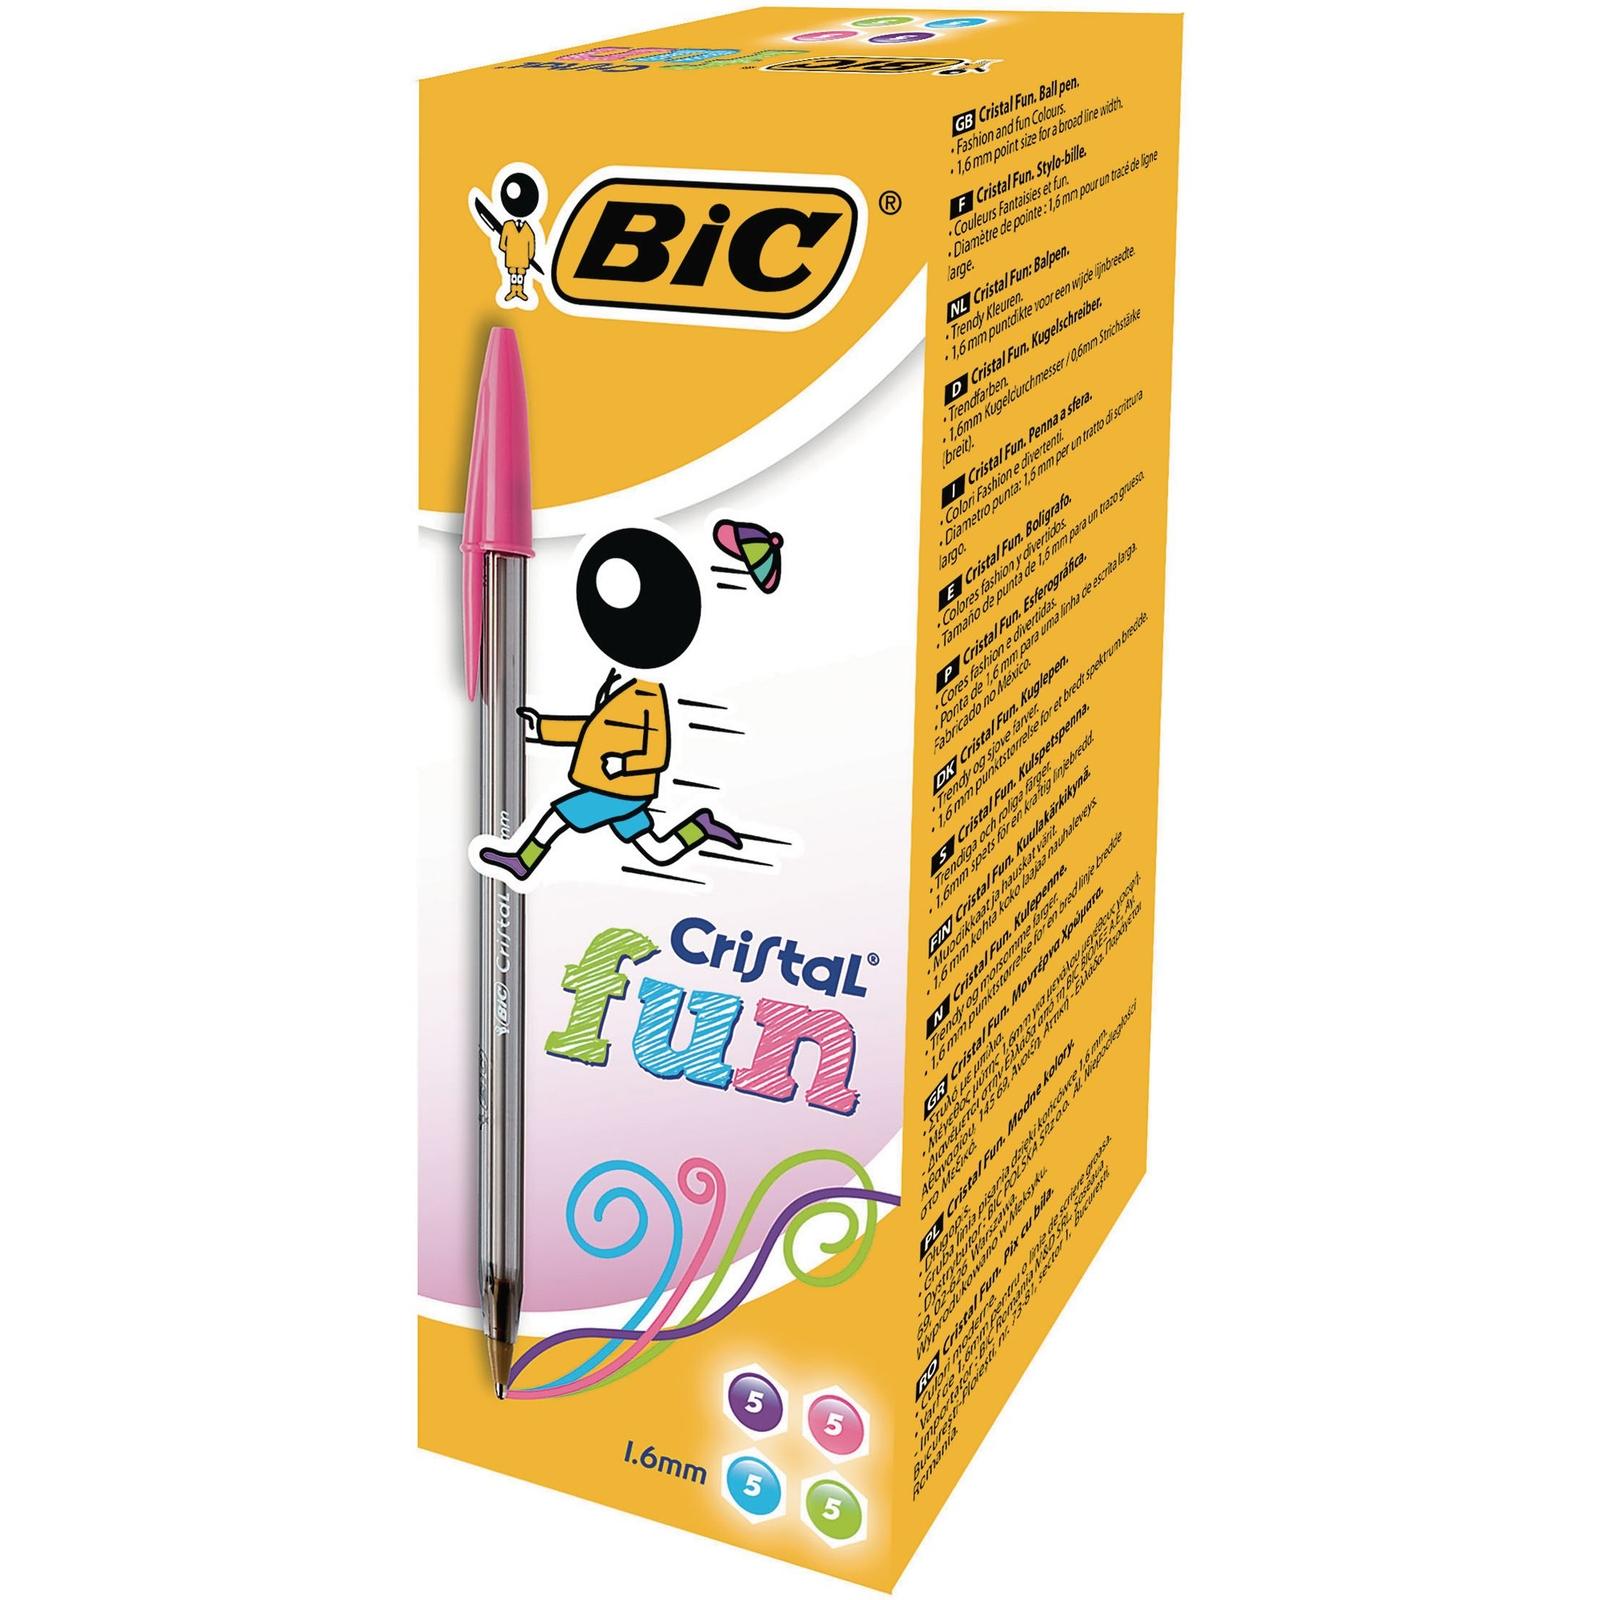 Bic Cristal Fun Ballpoint Pen Assorted - Pack of 20